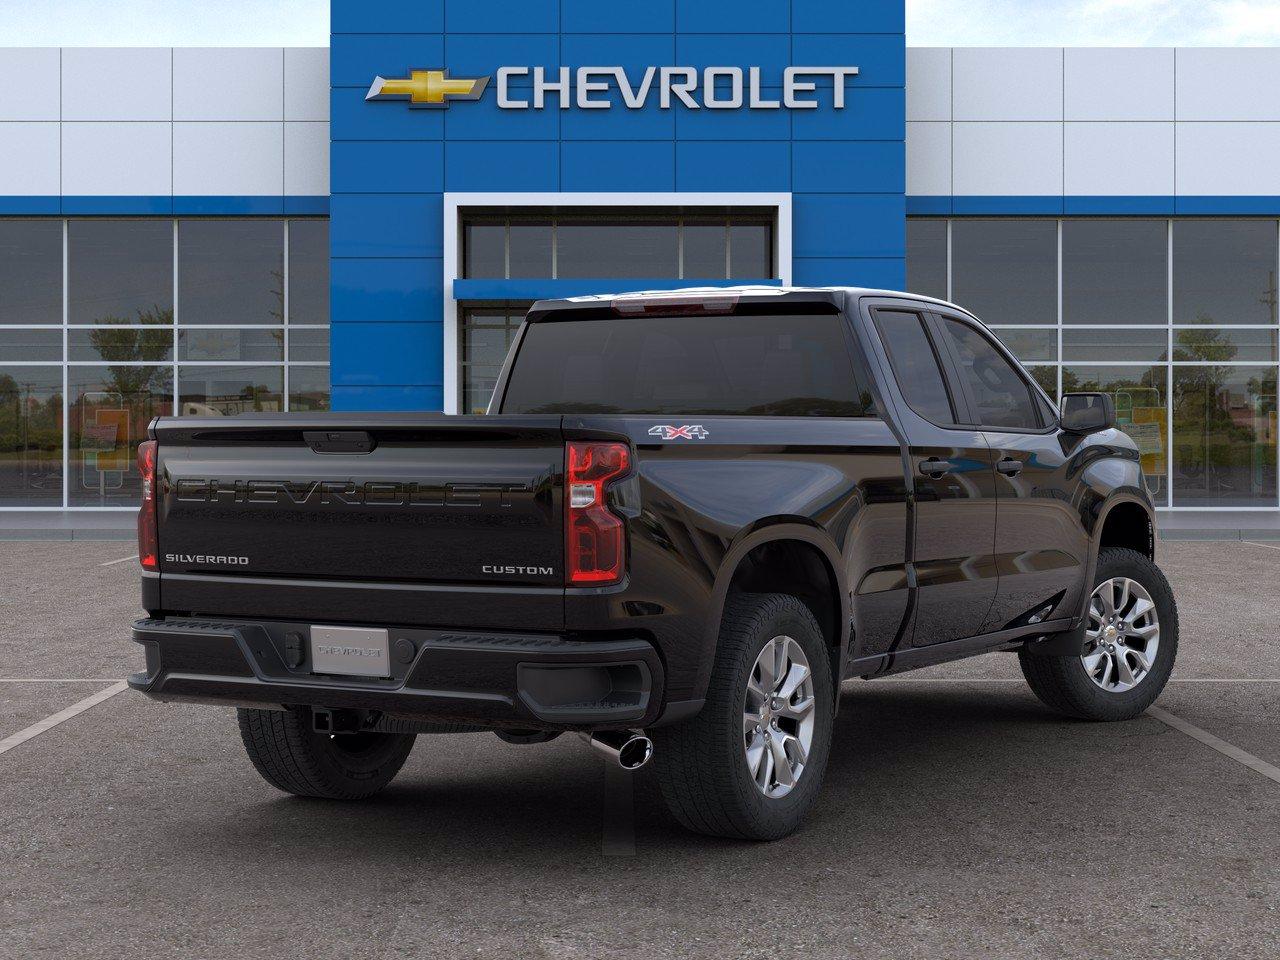 2020 Chevrolet Silverado 1500 Double Cab 4x4, Pickup #C201489 - photo 2